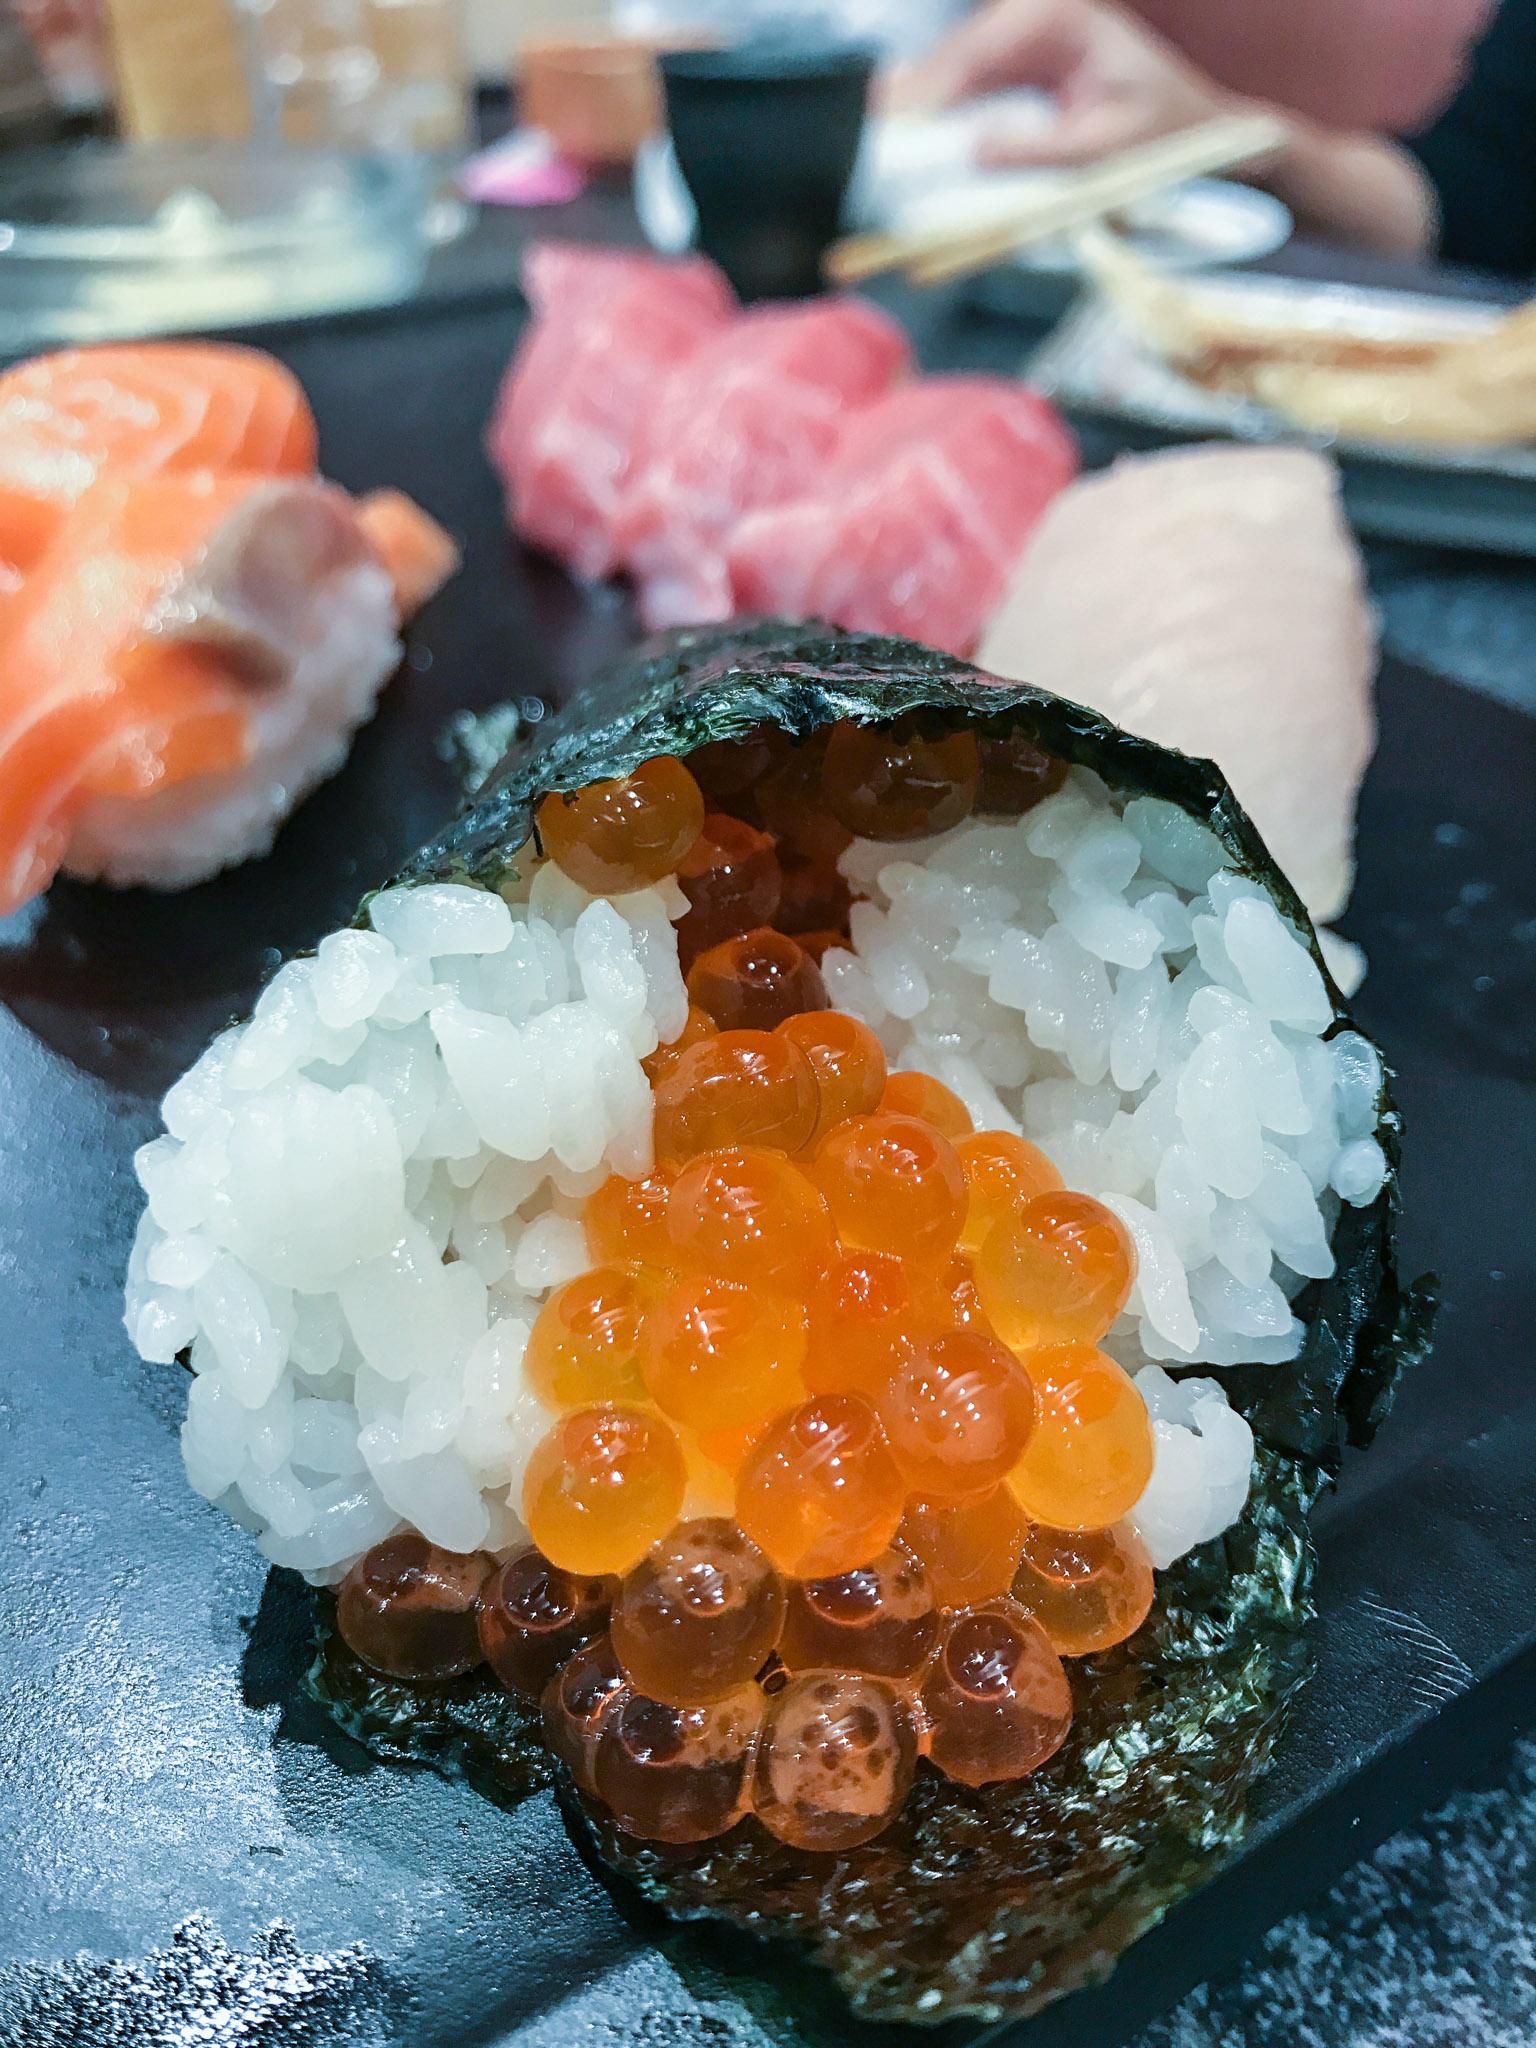 That's salmon roe, aka salmon fish eggs. YUM!